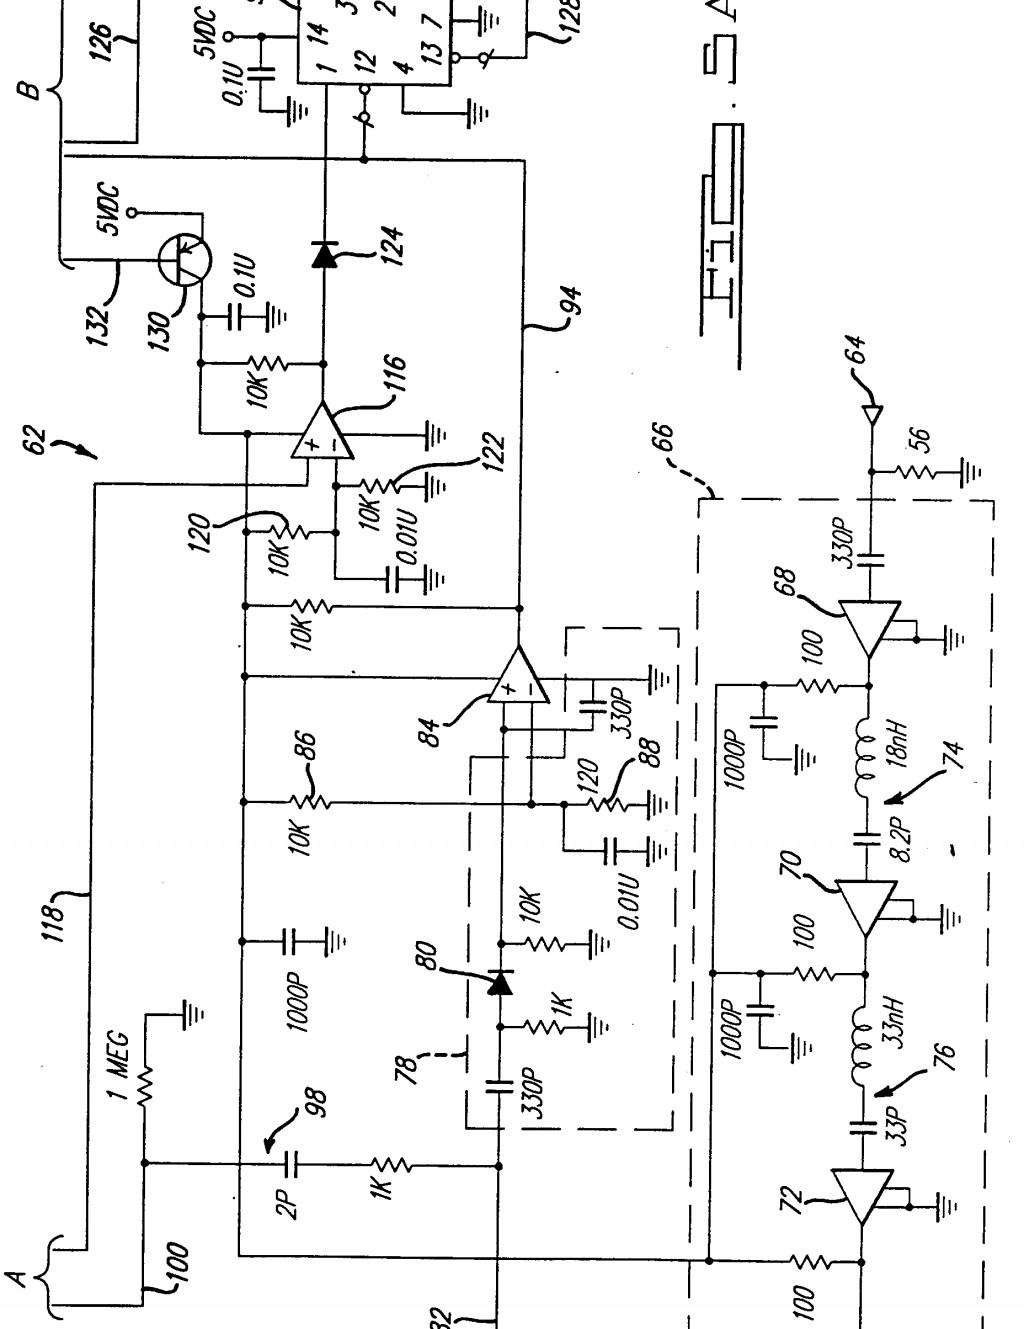 hight resolution of chamberlain garage door opener wiring diagram garage door opener wiring diagram futuristic chamberlain jesanet exceptional